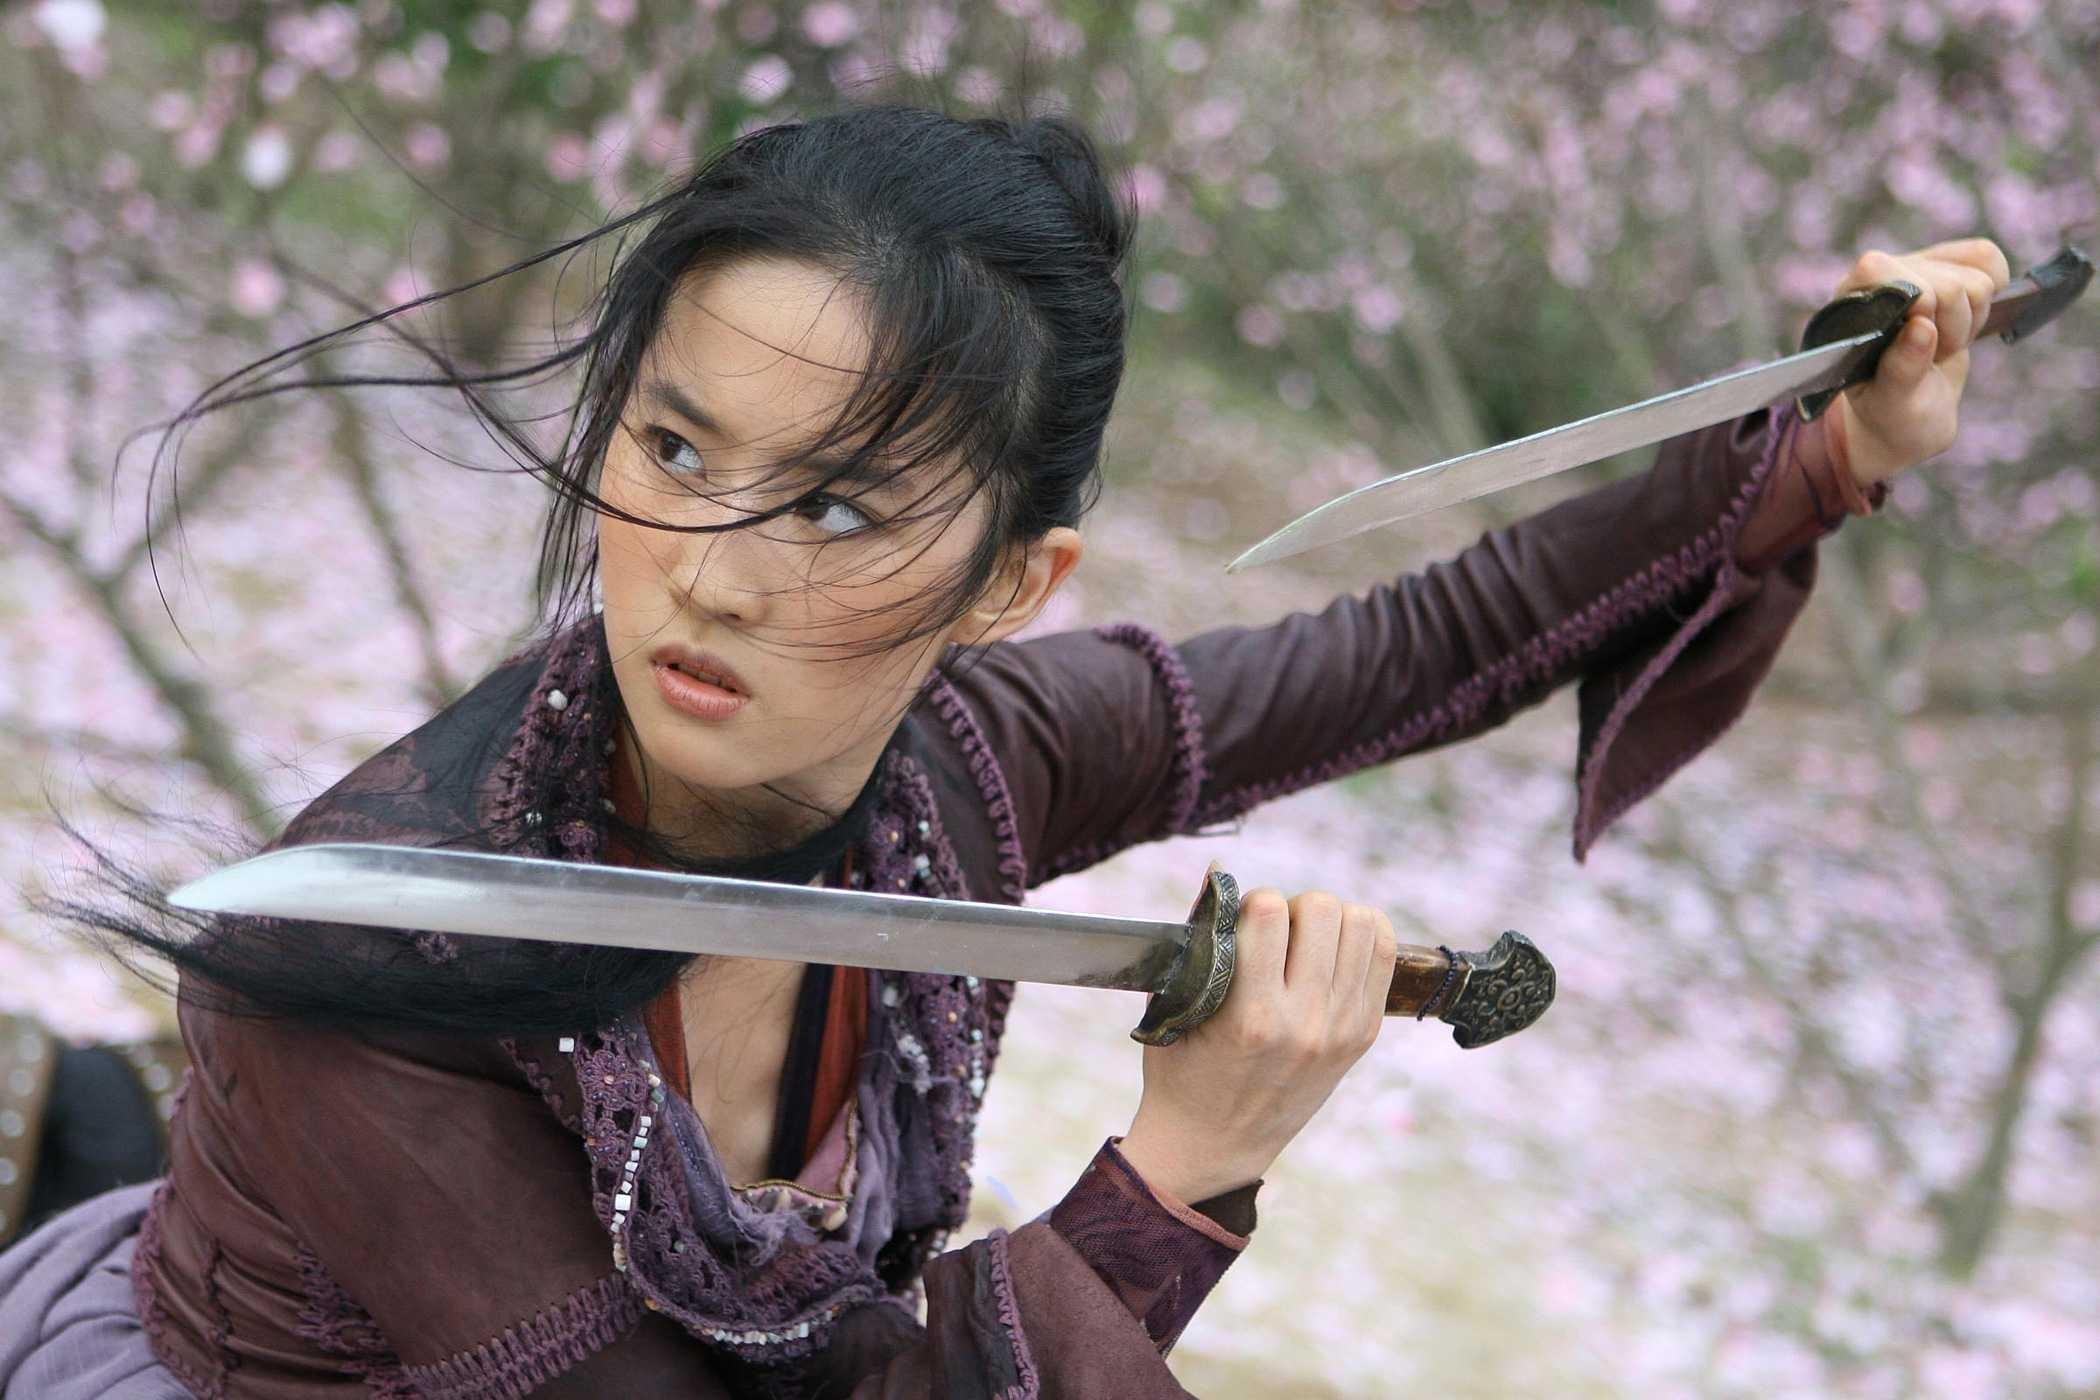 People 2100x1400 Asian sword The Forbidden Kingdom women brunette brown eyes knife looking away movies Crystal Liu